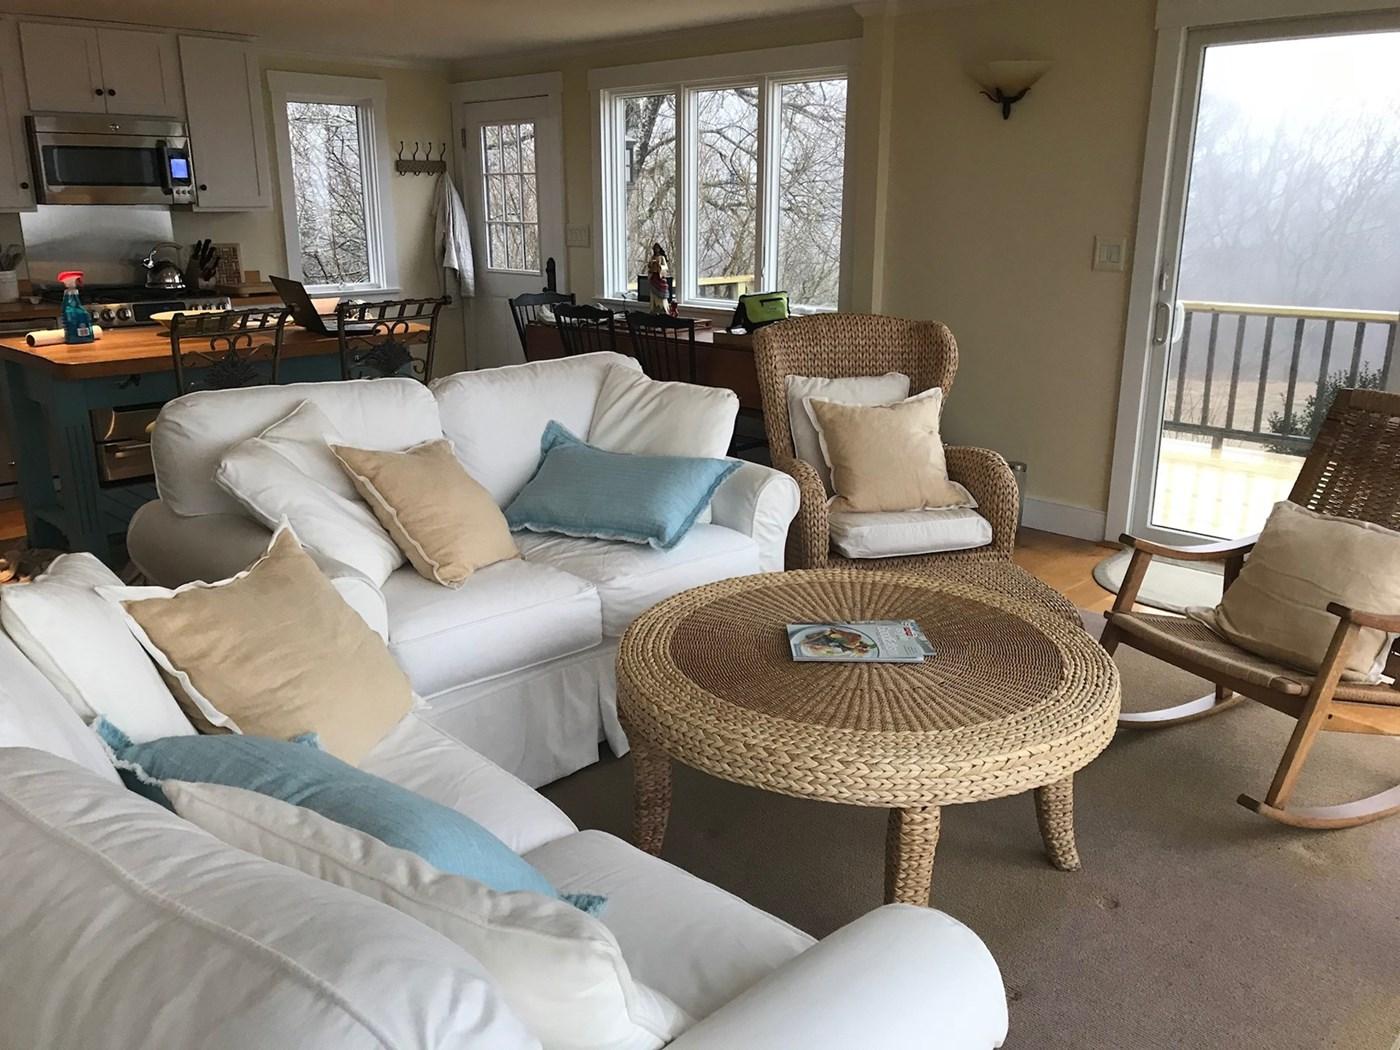 Aquinnah vacation rental home in marthas vineyard ma 02535 id 29382